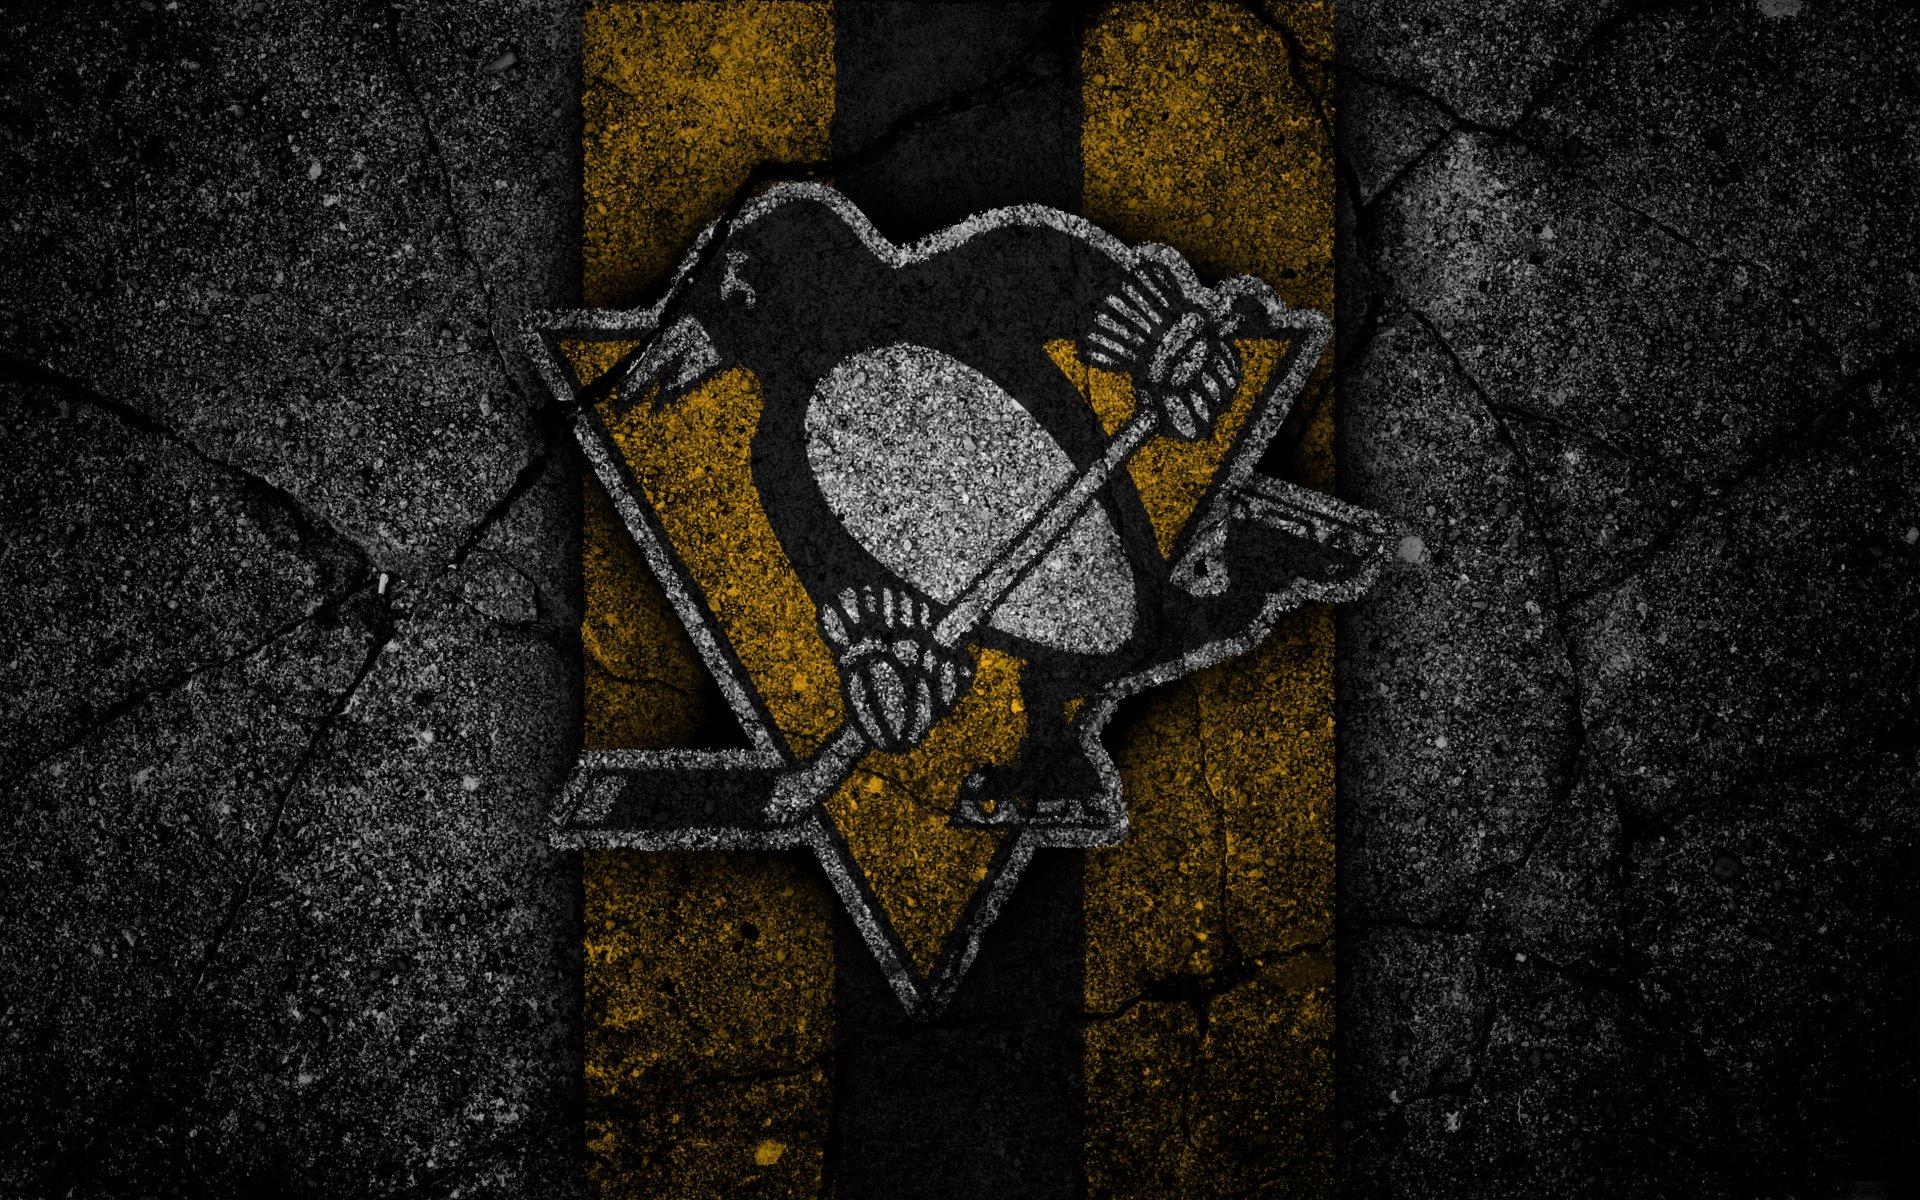 Pittsburgh Penguins 4k Ultra HD Wallpaper | Background ...